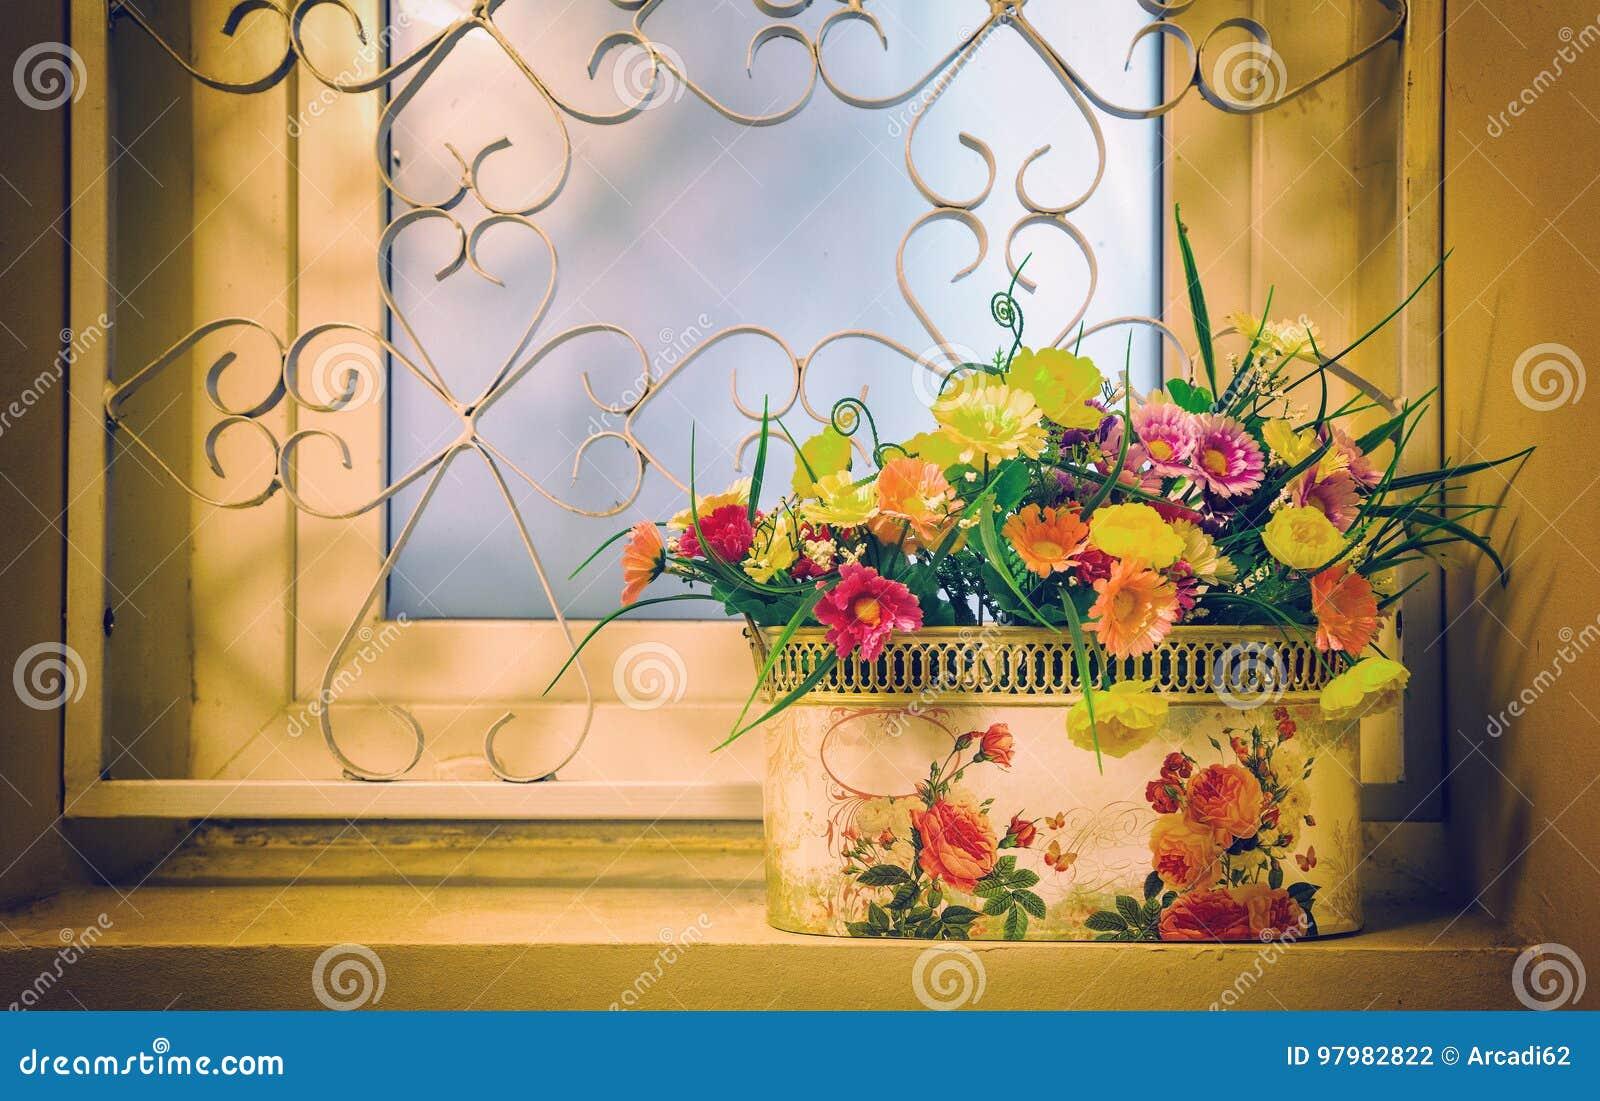 Potenciômetro das flores na janela